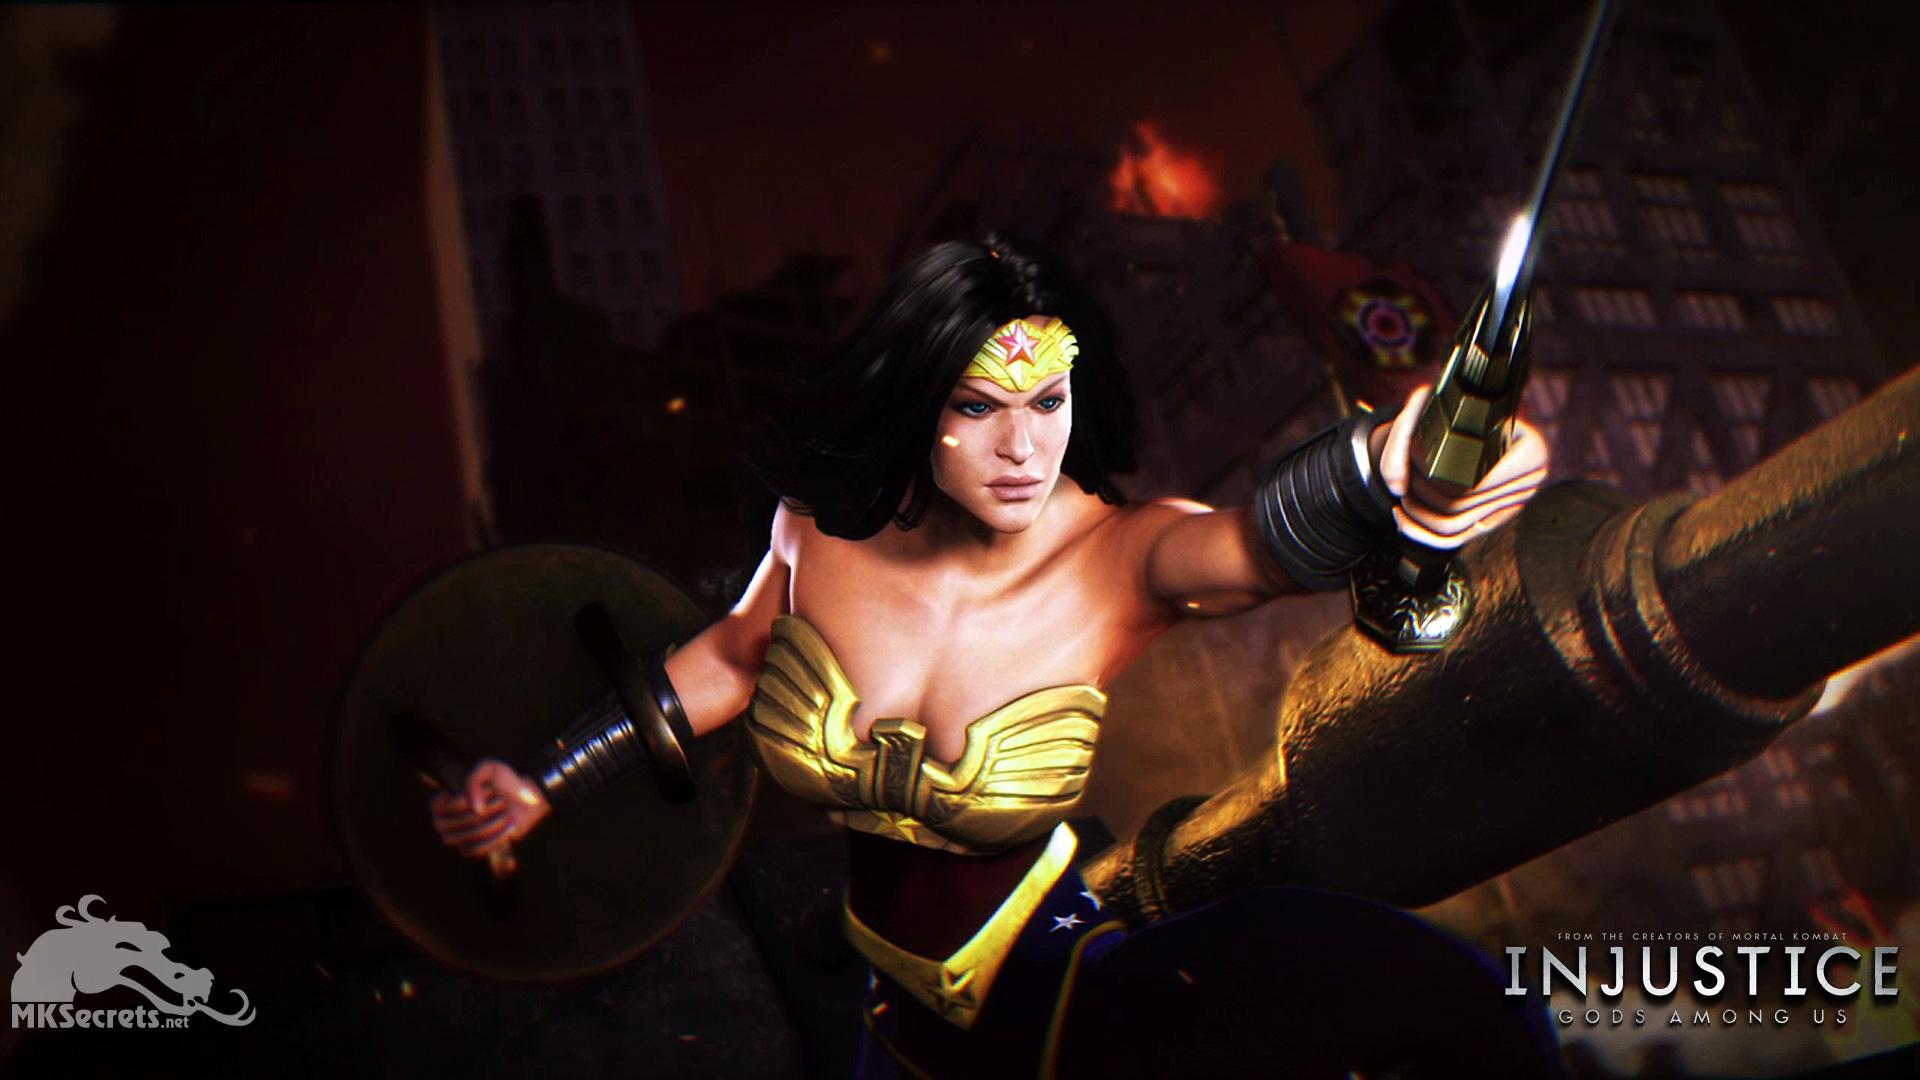 Injustice Gods Among Us Wallpaper Wonder Woman